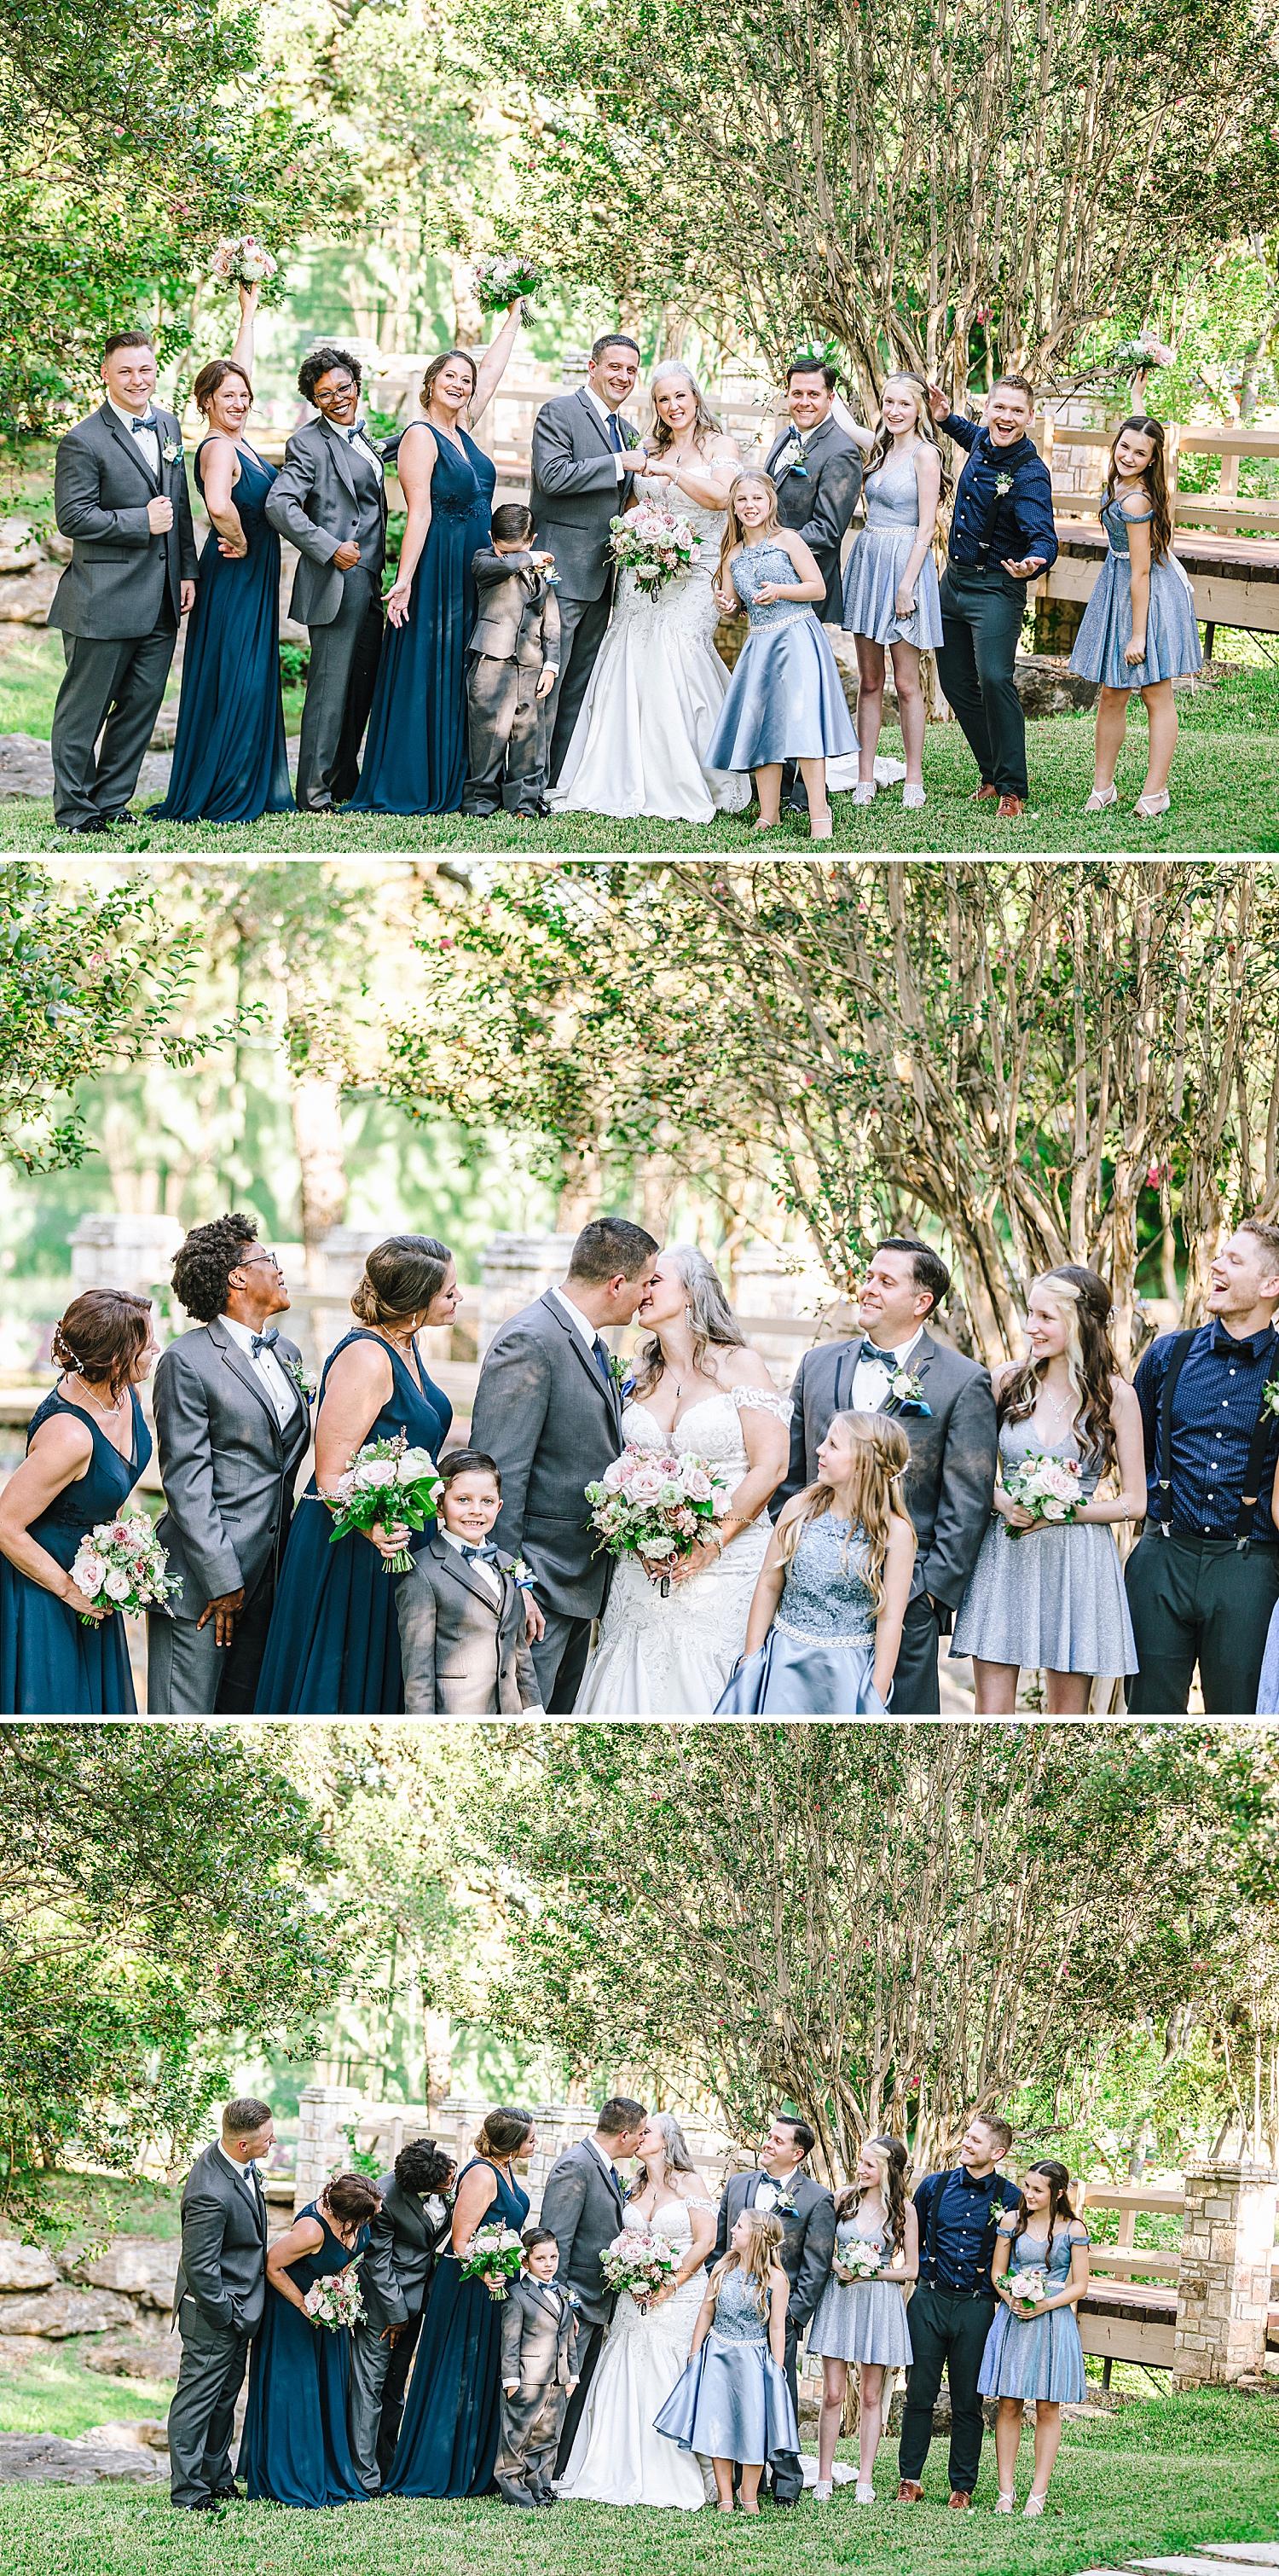 The-Club-at-Garden-Ridge-Military-Wedding-Carly-Barton-Photography_0076.jpg